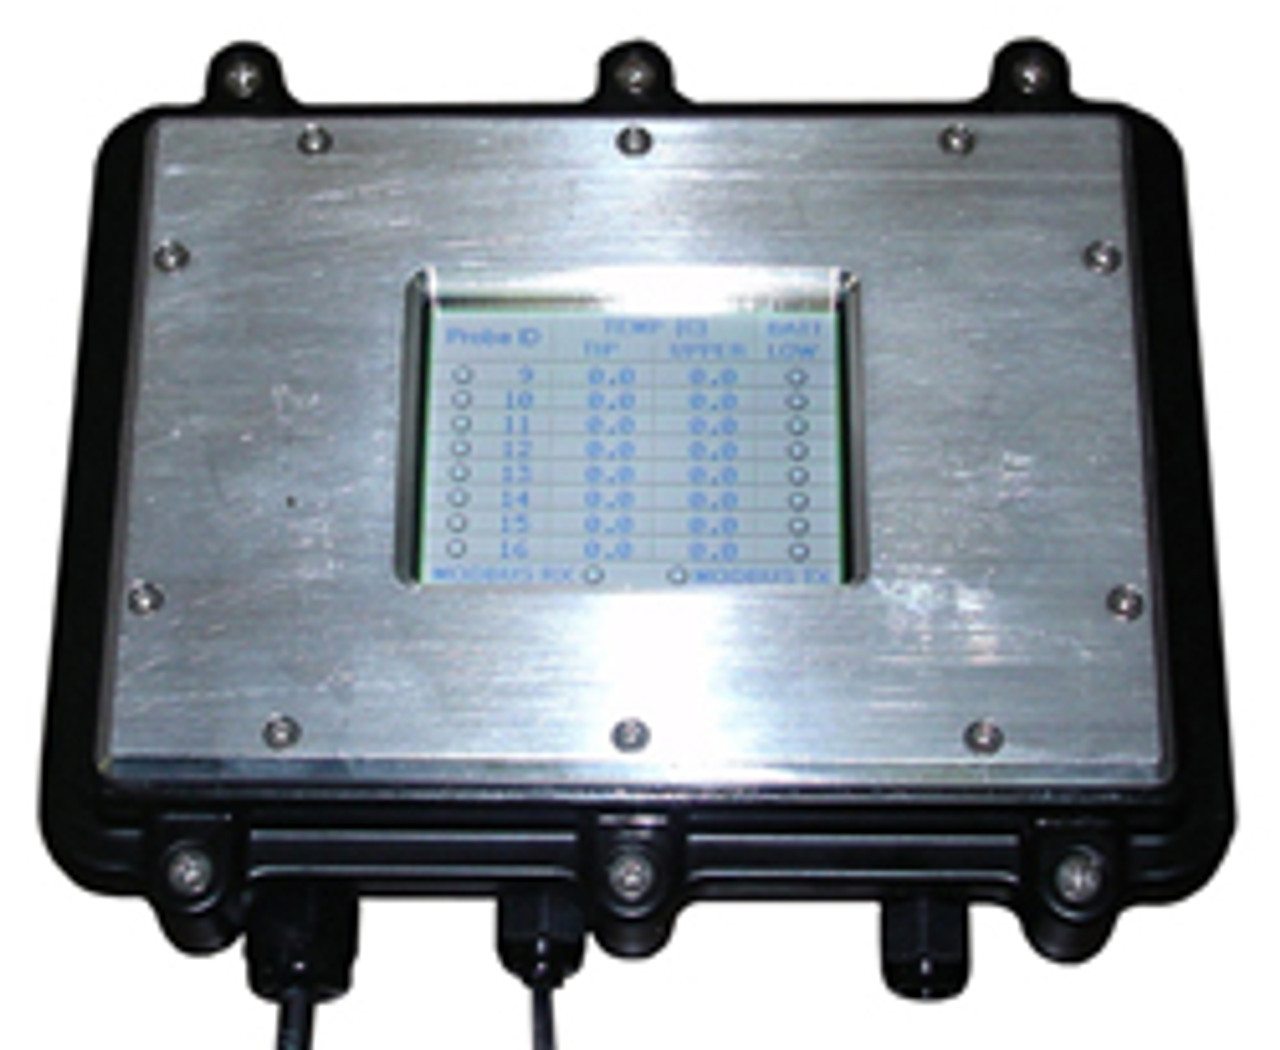 EcoProbe Wireless Reciever